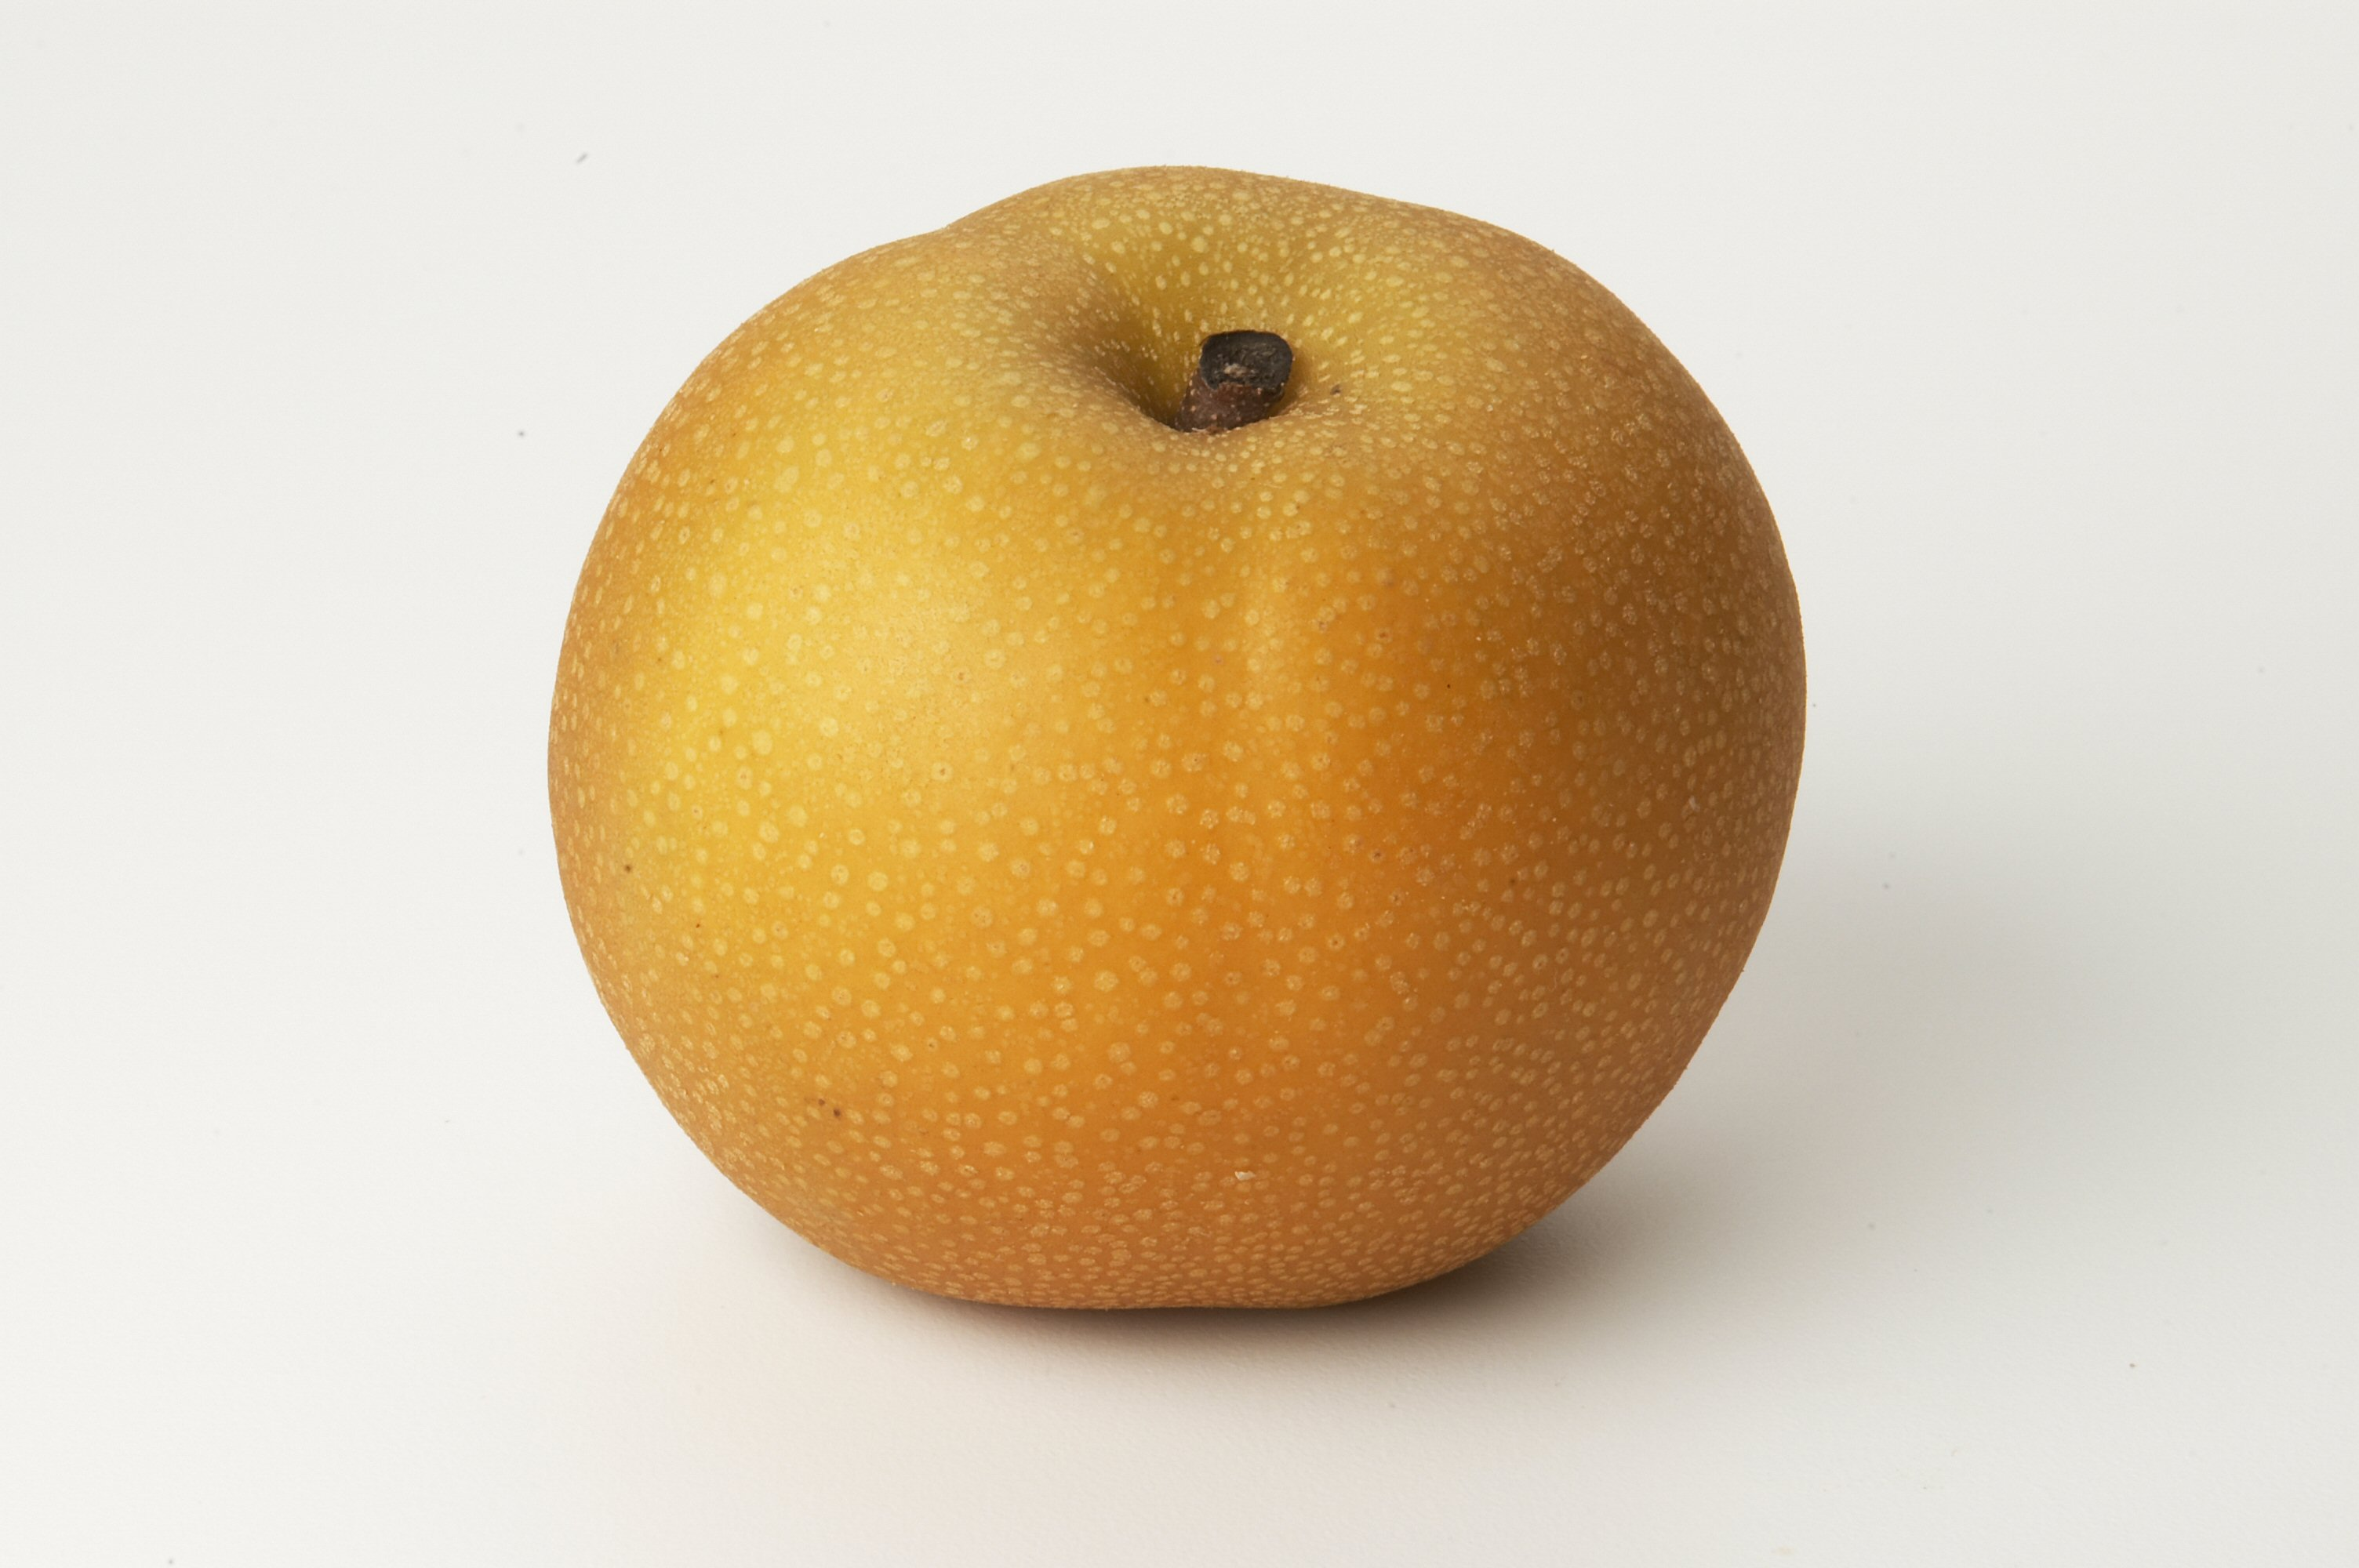 Pear Asian